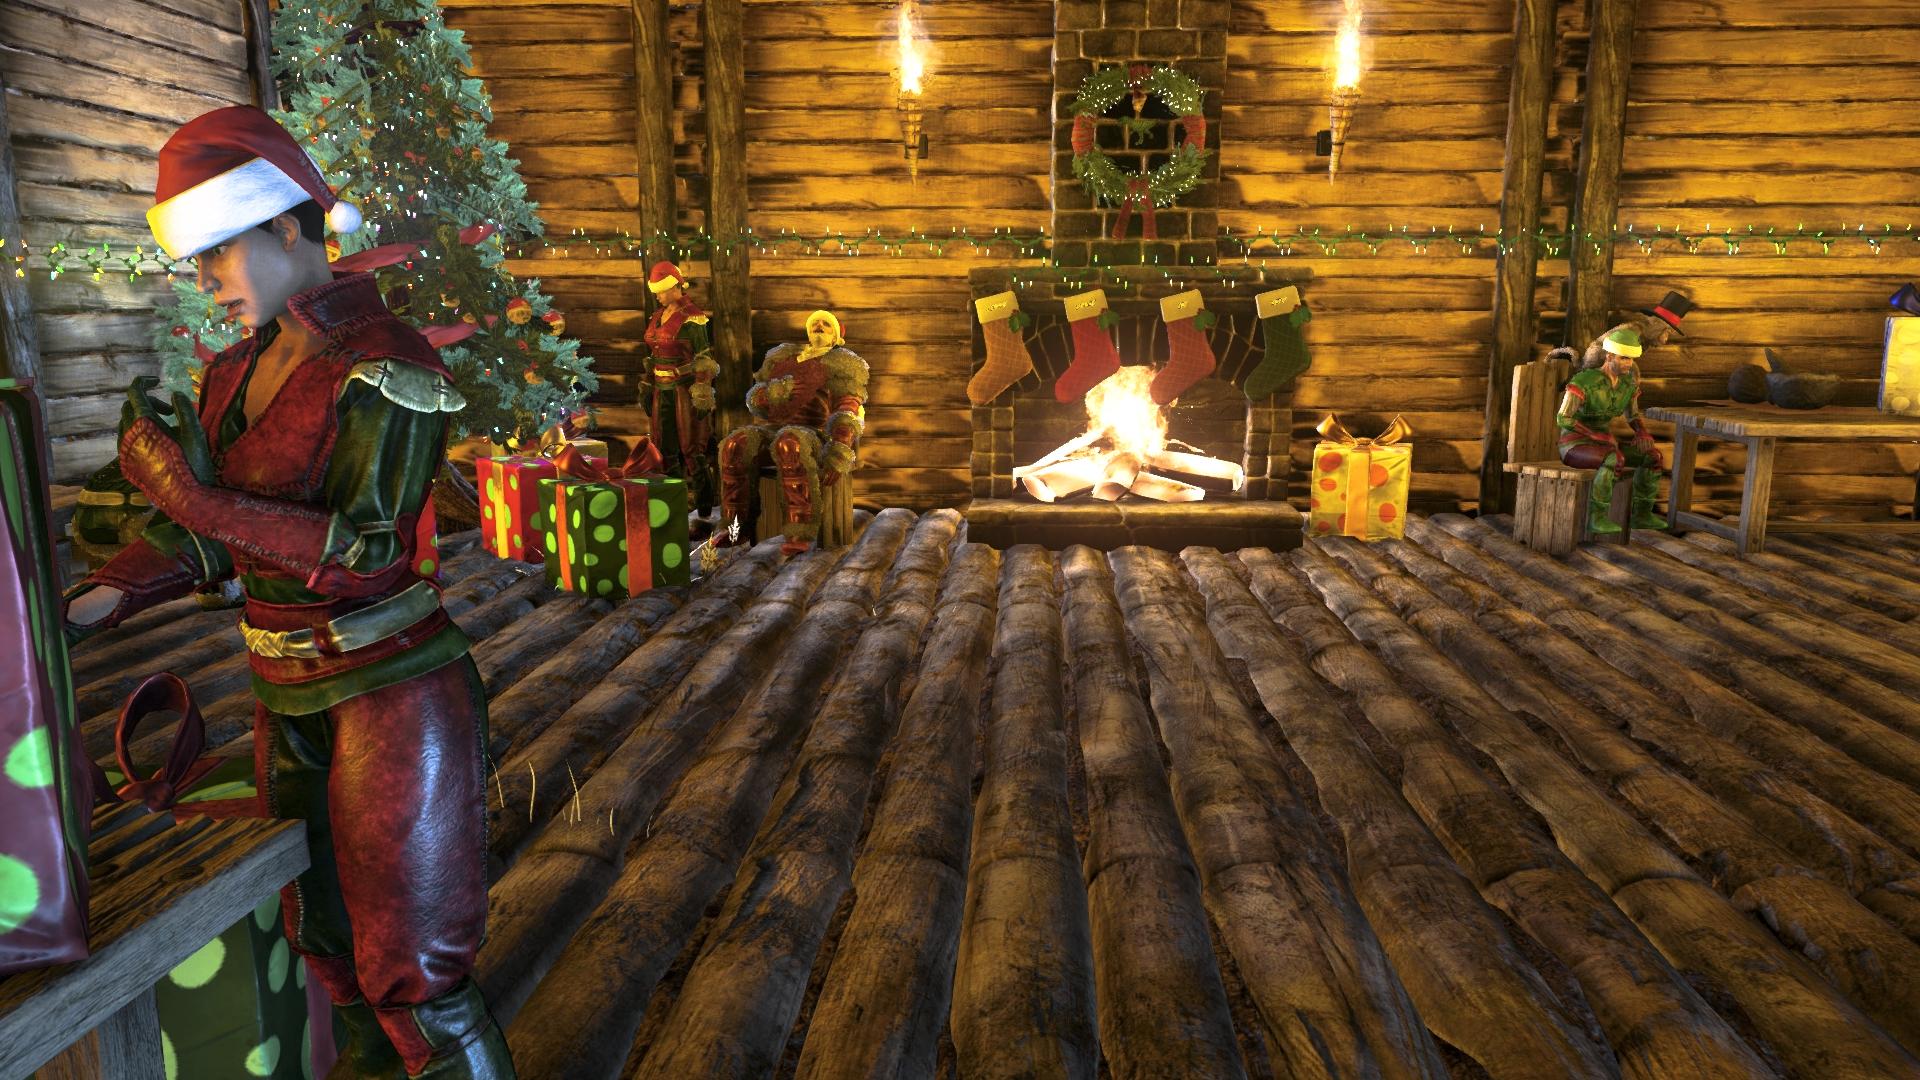 Subspace radio ark winter wonderland sotf naughty or nice ark winter wonderland sotf naughty or nice winter sale malvernweather Image collections